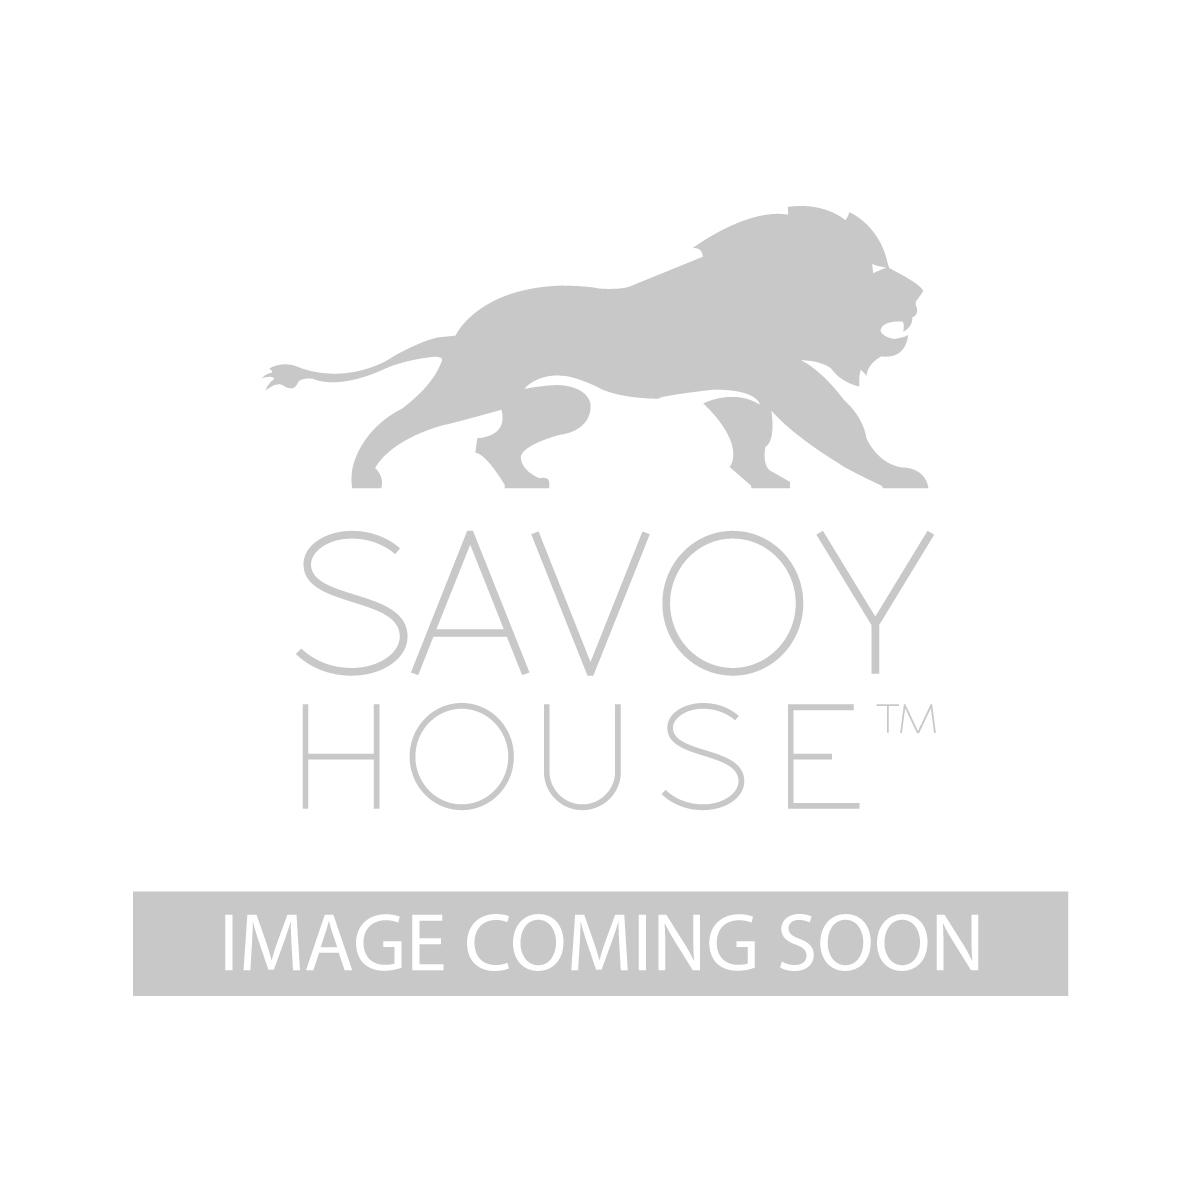 7 9200 5 11 citrine 5 light pendant by savoy house for Www savoyhouse com